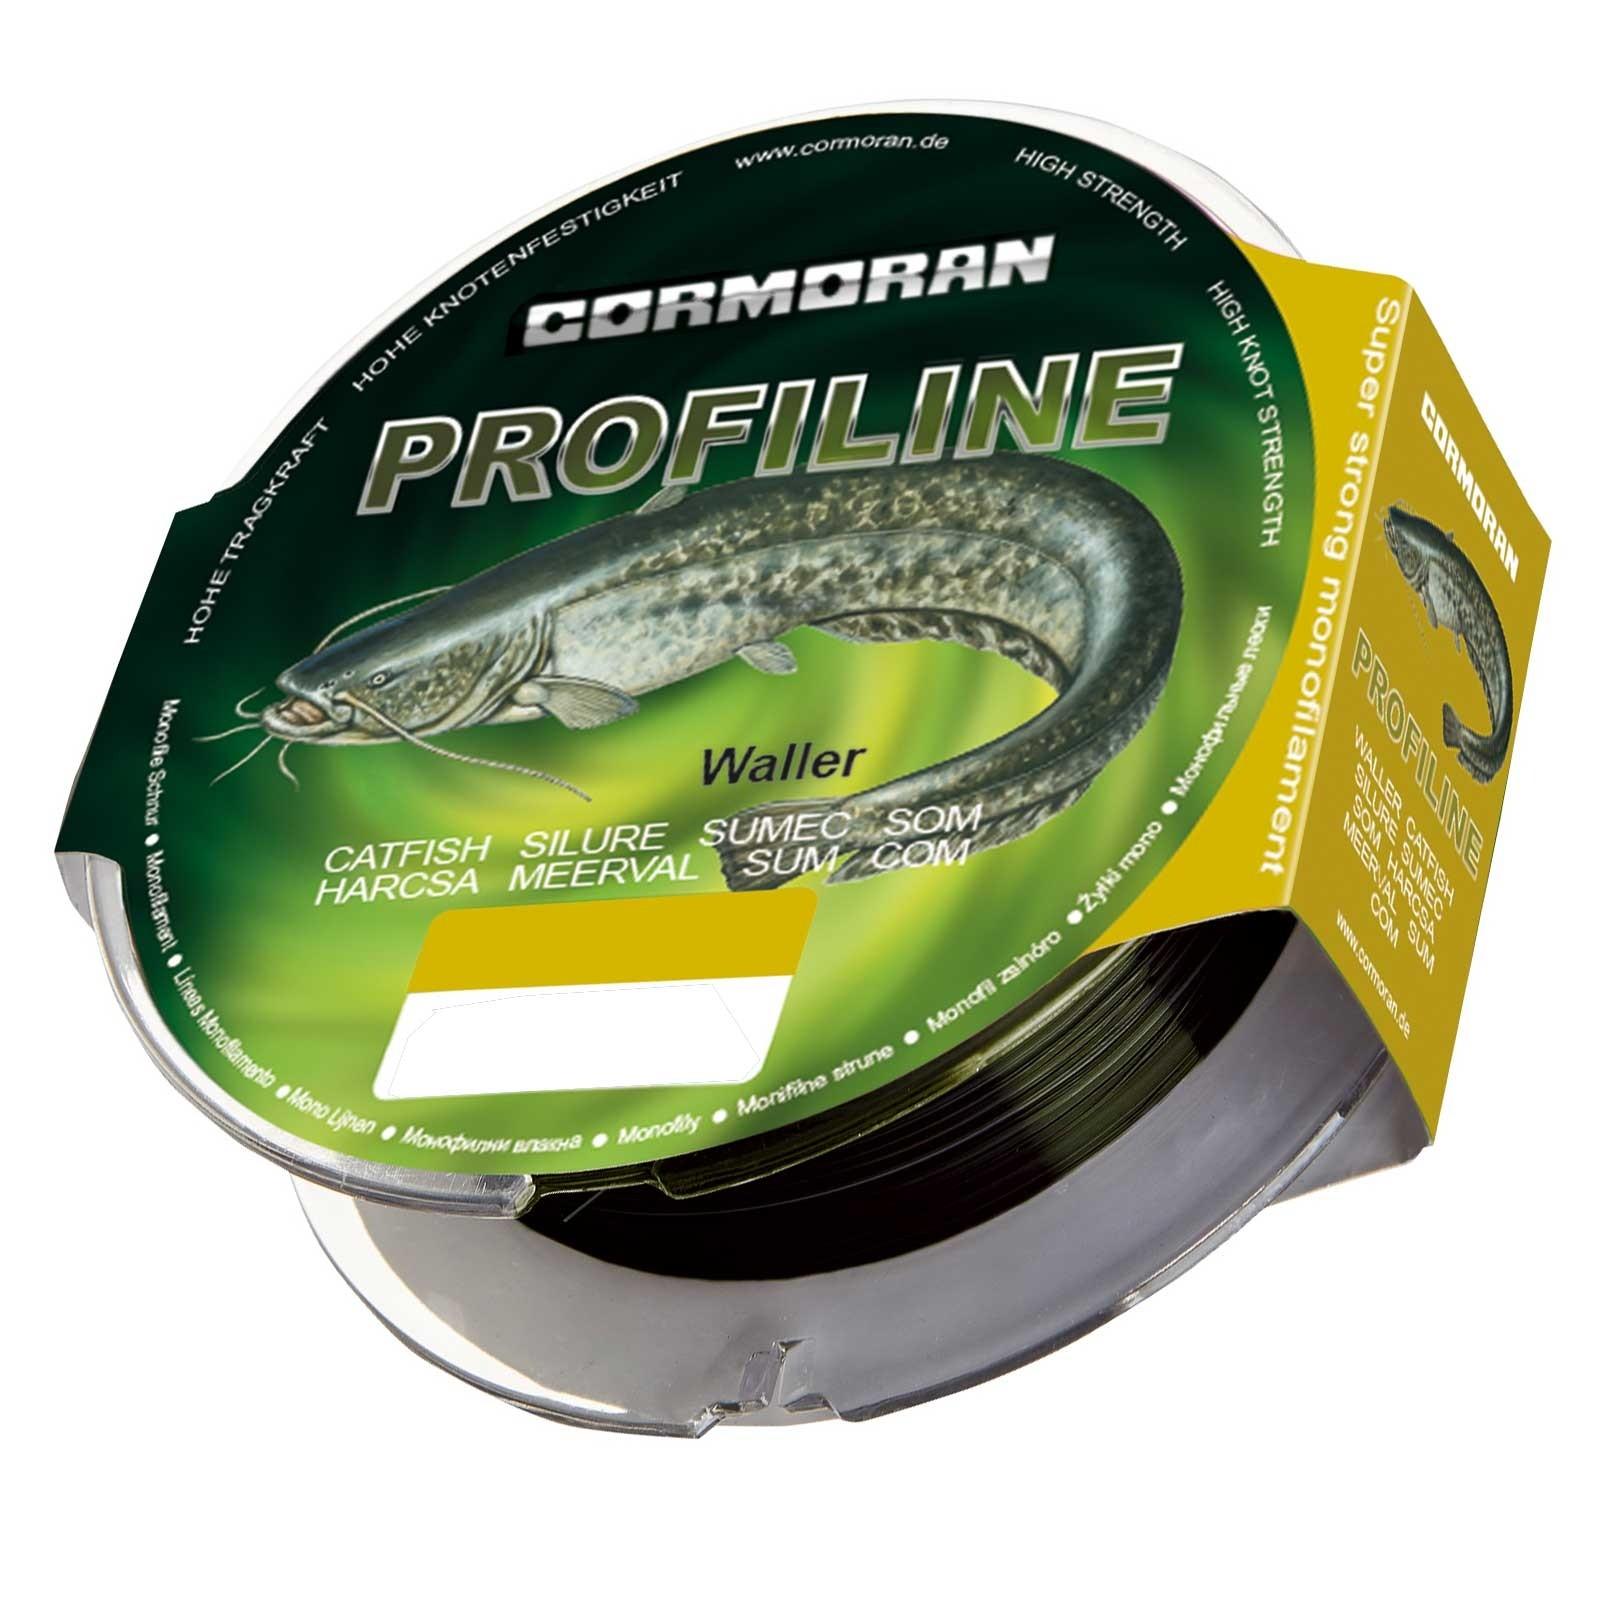 Cormoran Profiline Waller 200m 0,50mm 17,5kg Schnur Monofil